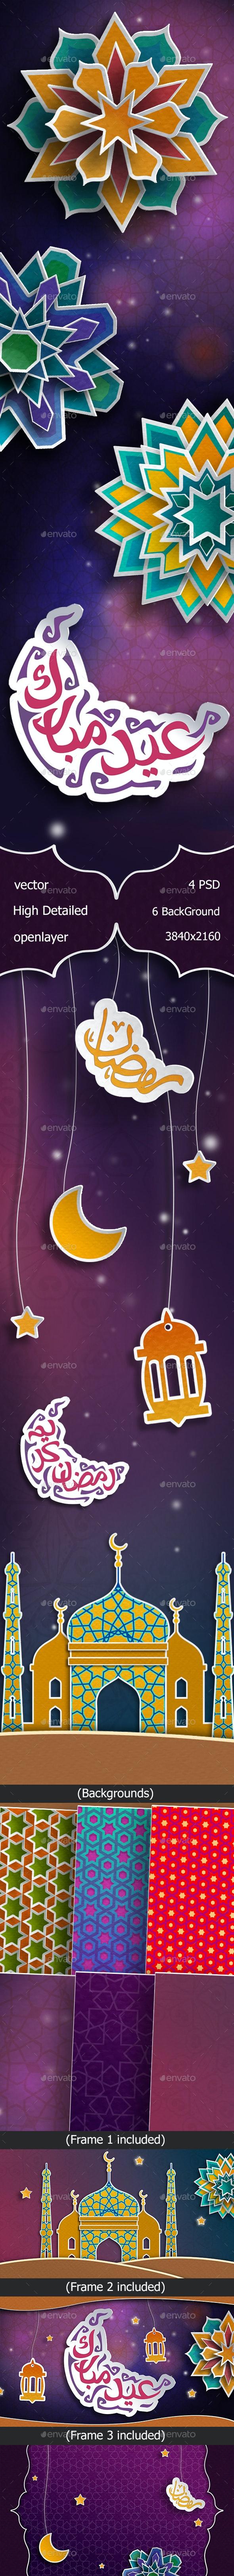 Colorful Paper Ramadan - Miscellaneous Graphics